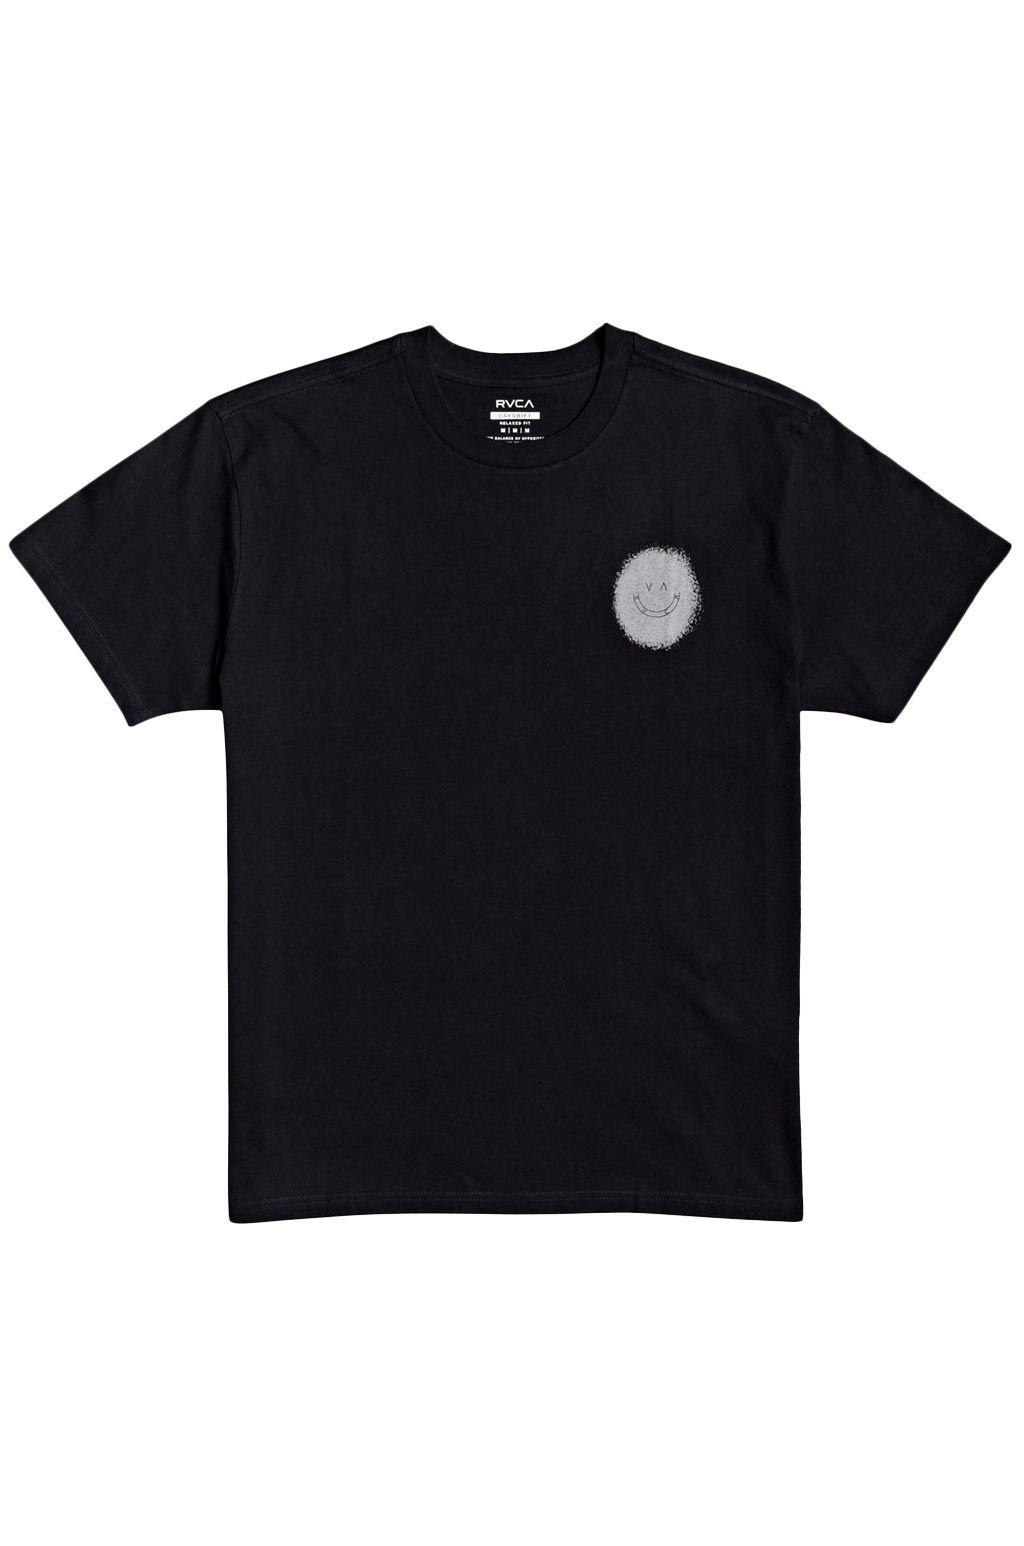 T-Shirt RVCA SKULLS AND ROSES SS BENJAMIN JEAN JEAN Black